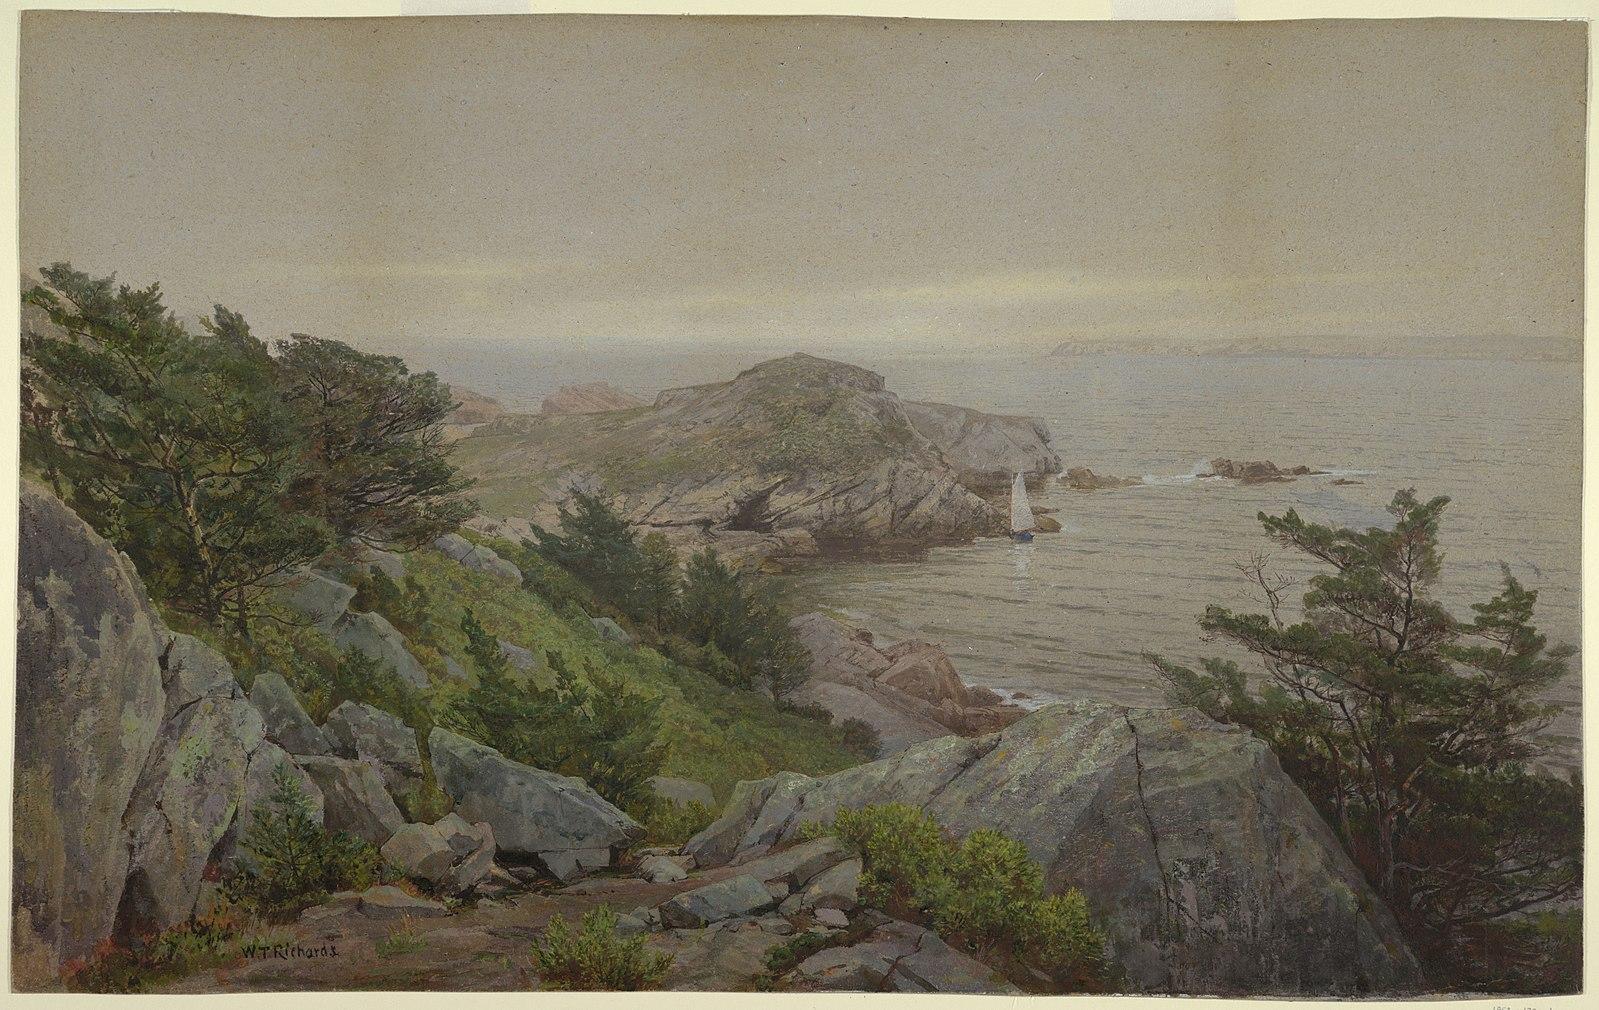 Mackerel Cove, Jamestown RI, c 1877